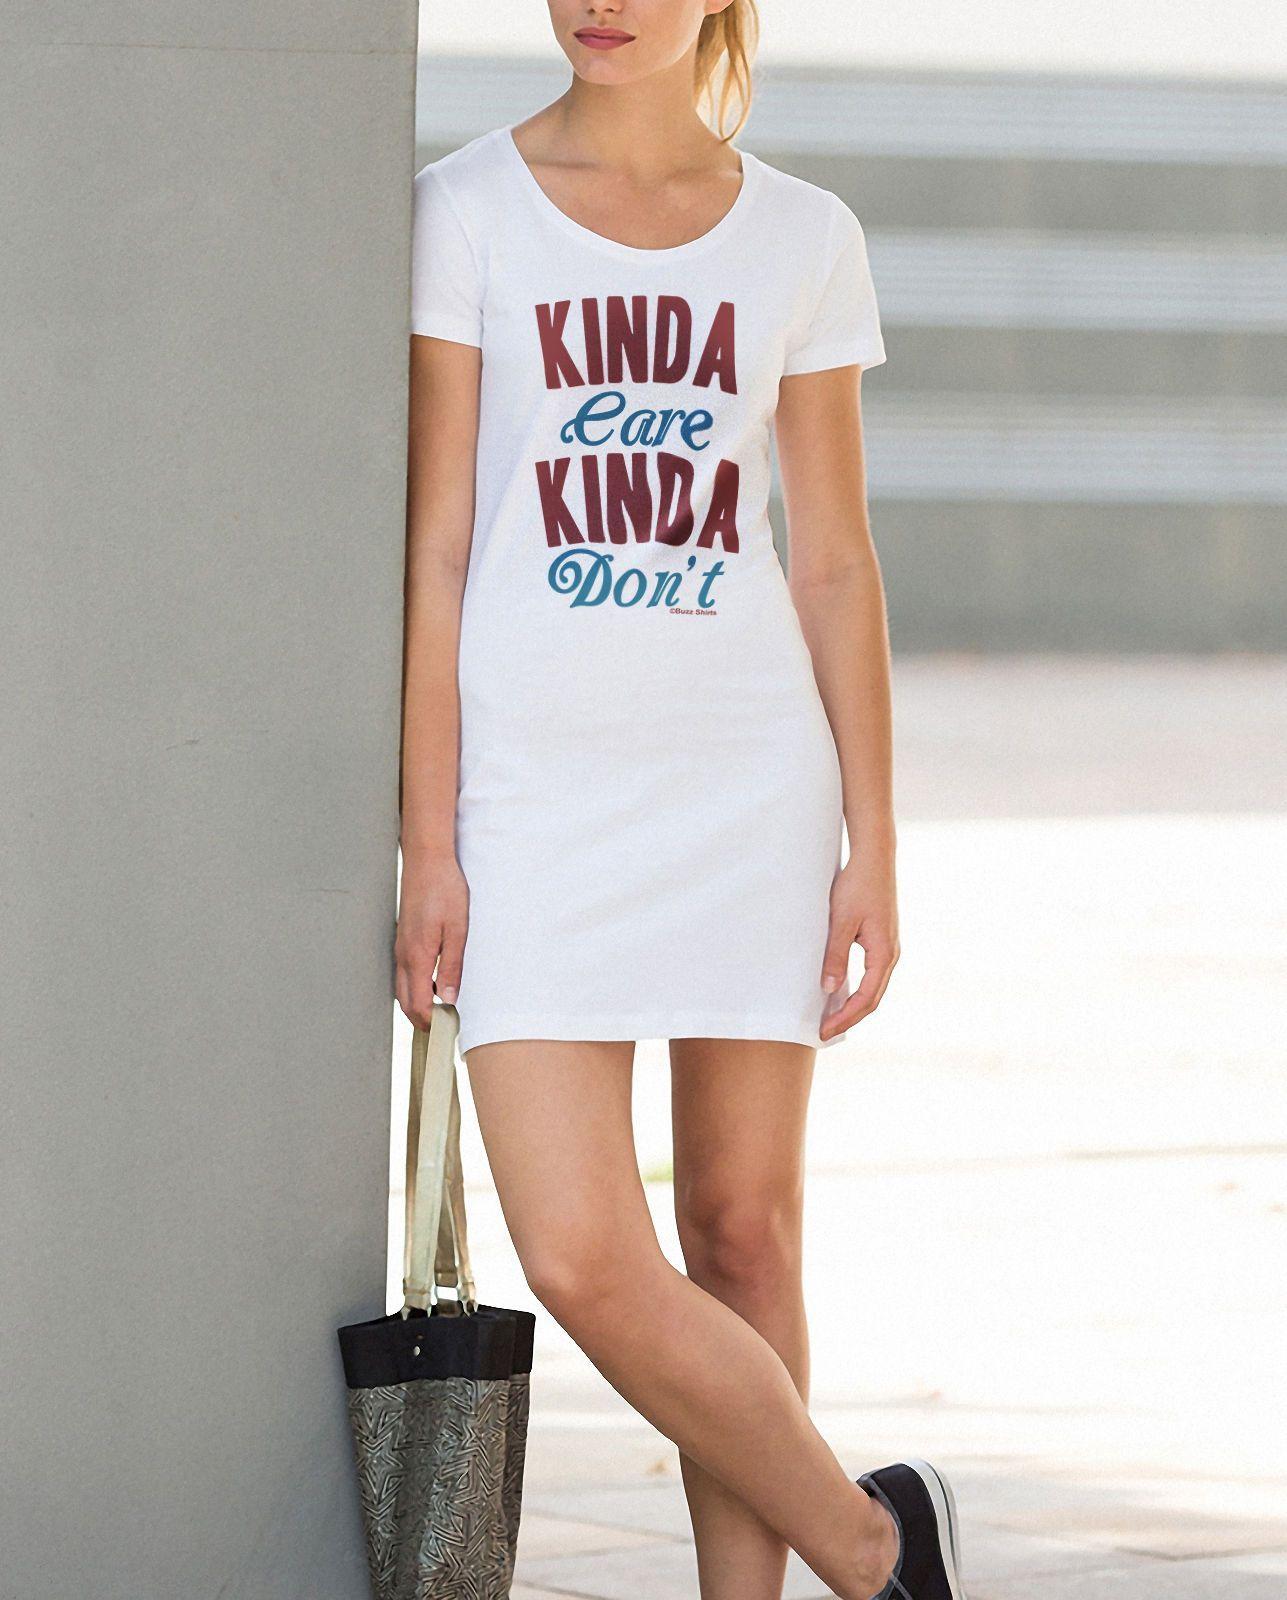 Ladies T Shirt Dress Summer Kinda Care Kinda Dont Funny Womens Fashion Shirt Dress Summer Retro Fashion Women Fashion [ 1600 x 1287 Pixel ]